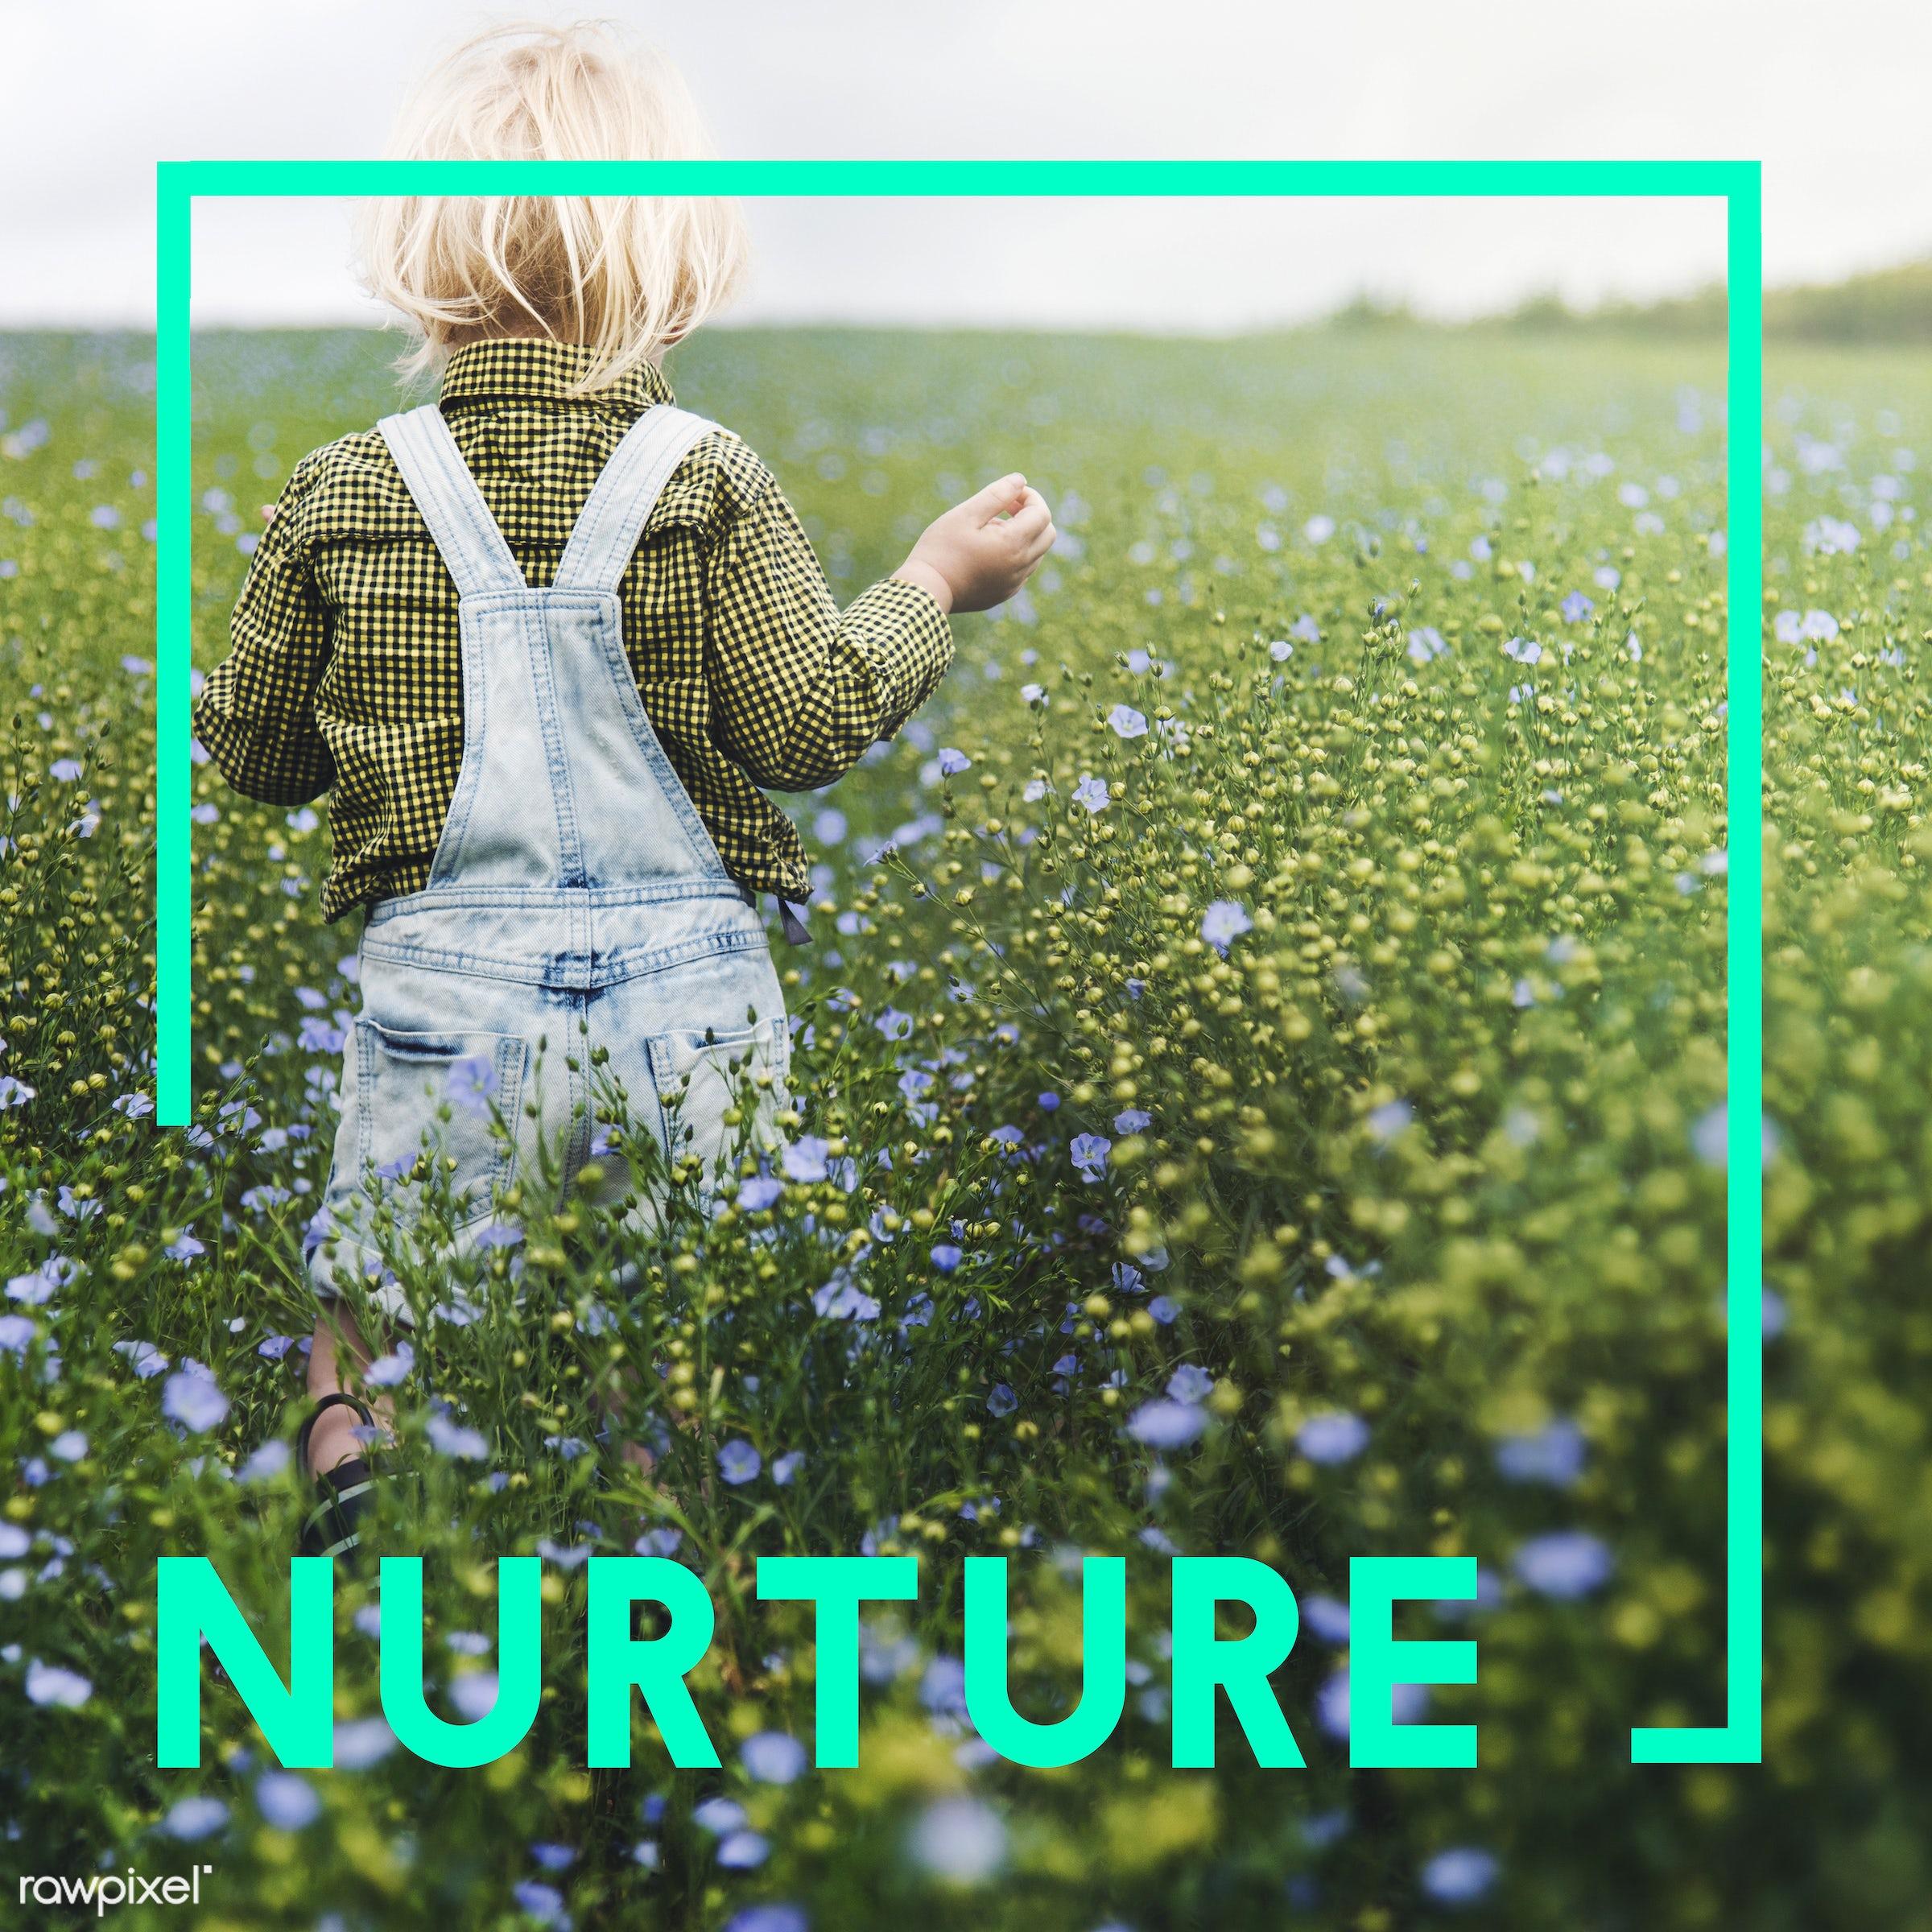 blonde, boy, brand, breeding, caucasian, dungarees, eco, ecology, environment, flower garden, flowers, fresh, friendly,...